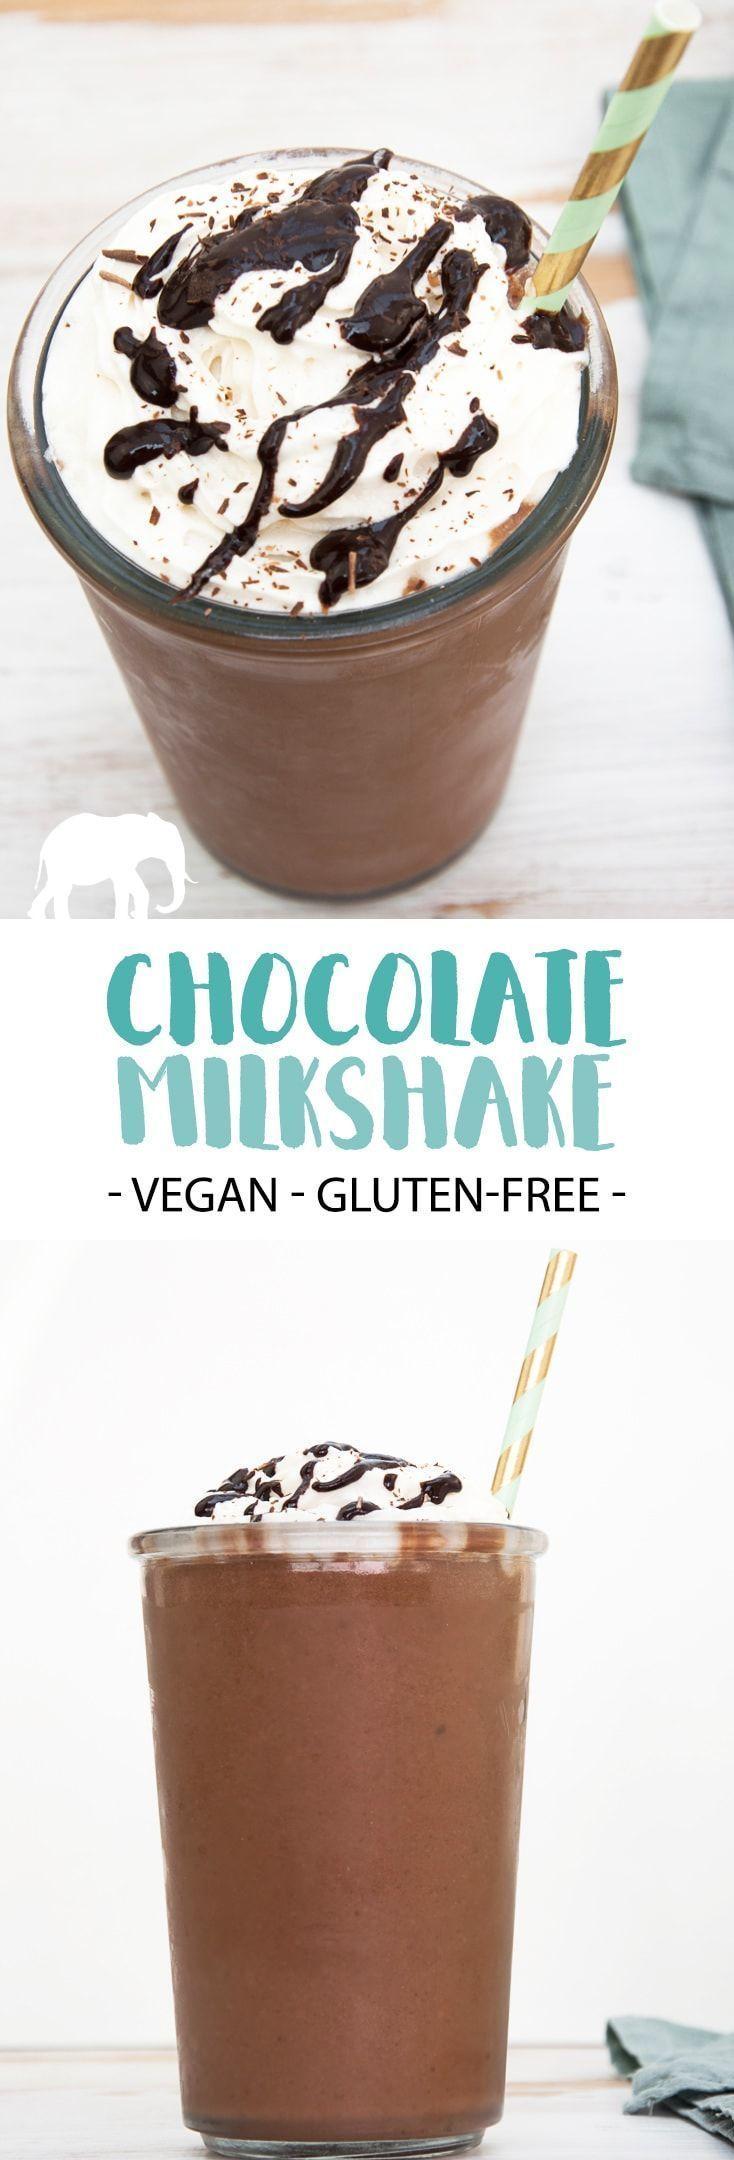 Milkshake - vegan and gluten-free |  via @elephantasticv